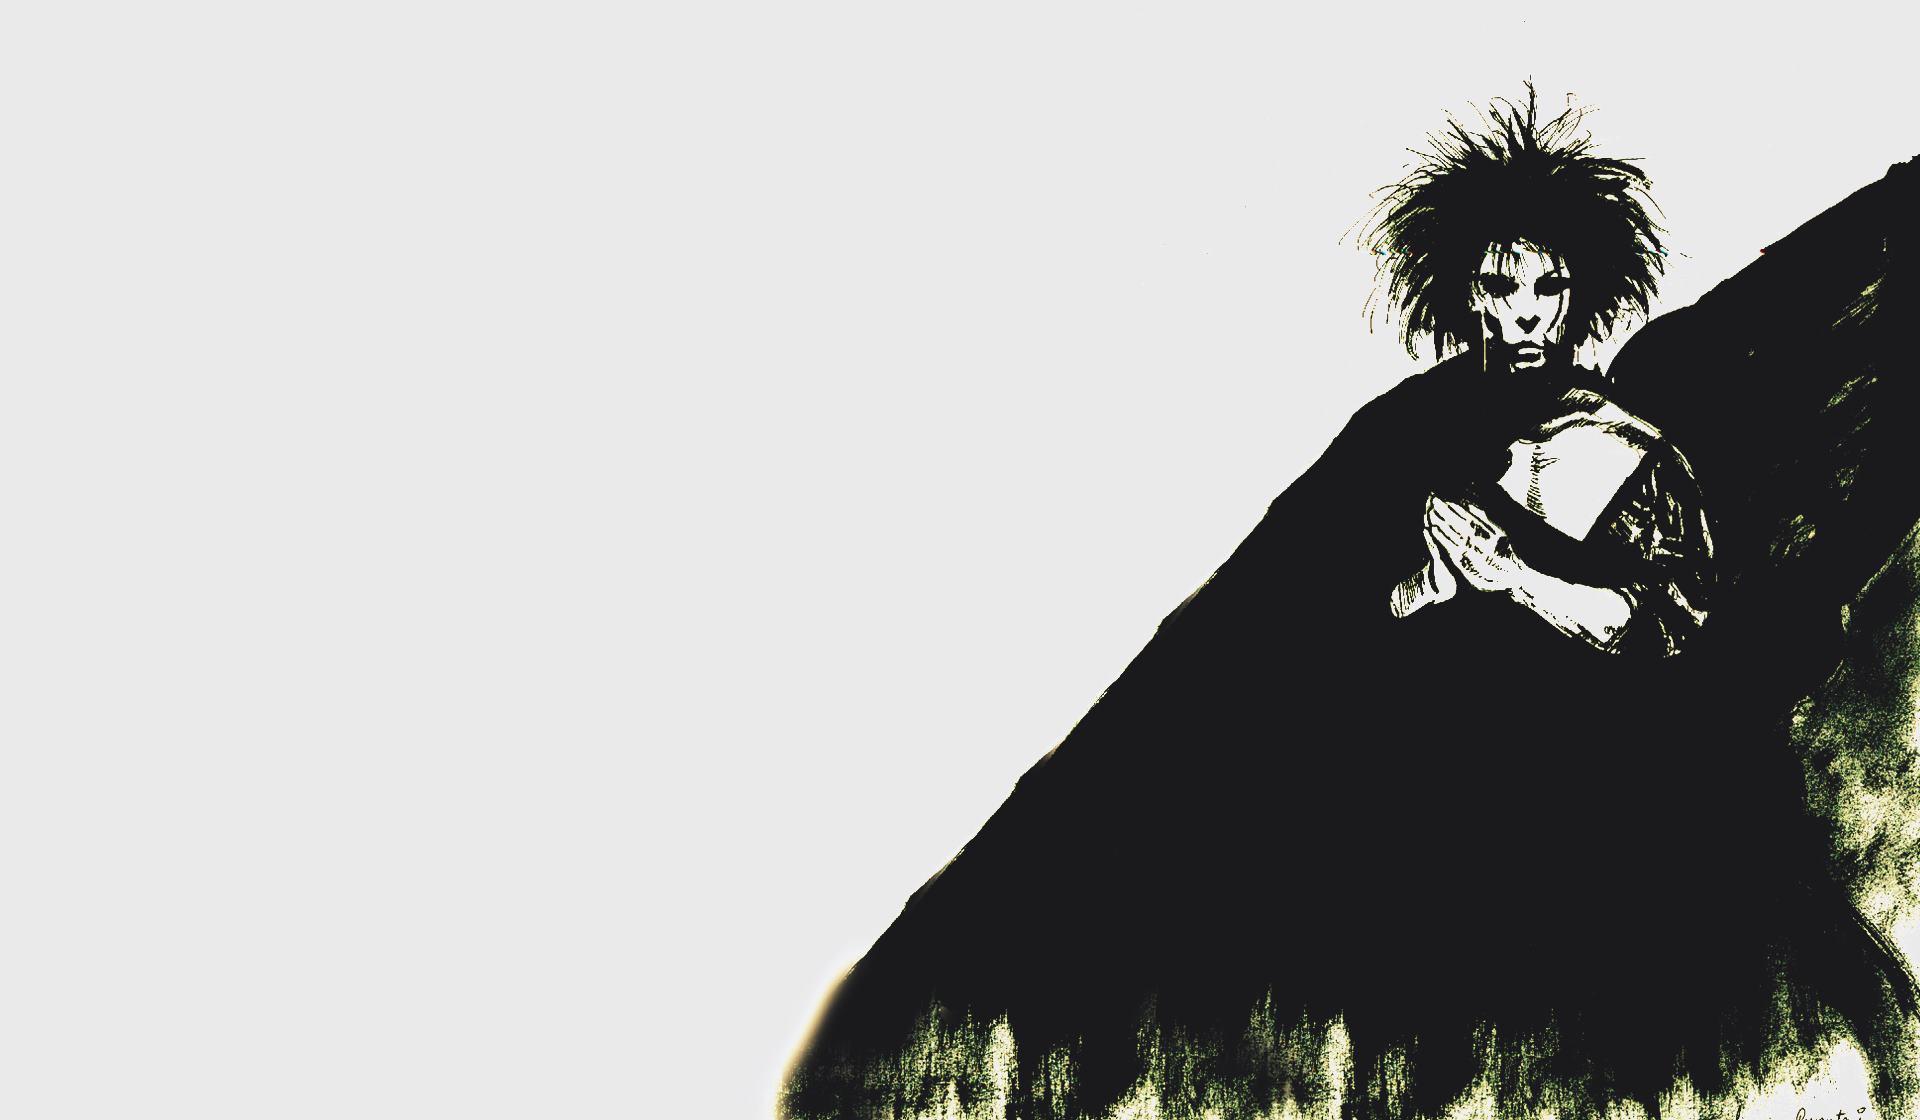 'The Sandman': La casa de muñecas de Neil Gaiman